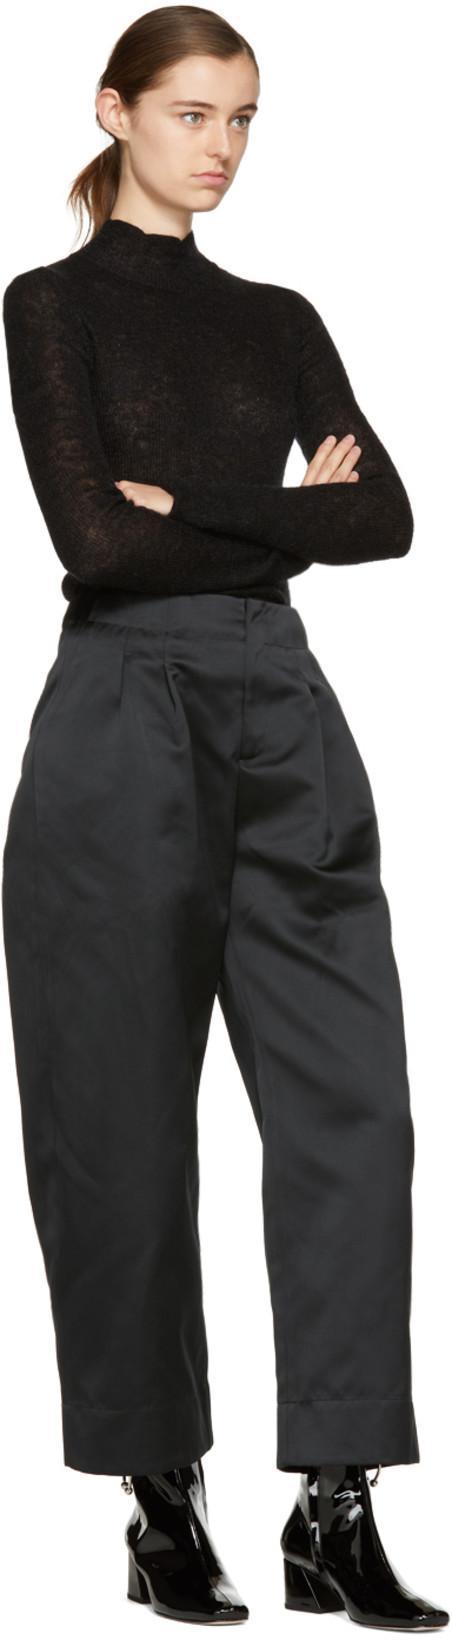 DORATEYMUR Nizip Silver Piercing Patent Leather Booties, Black